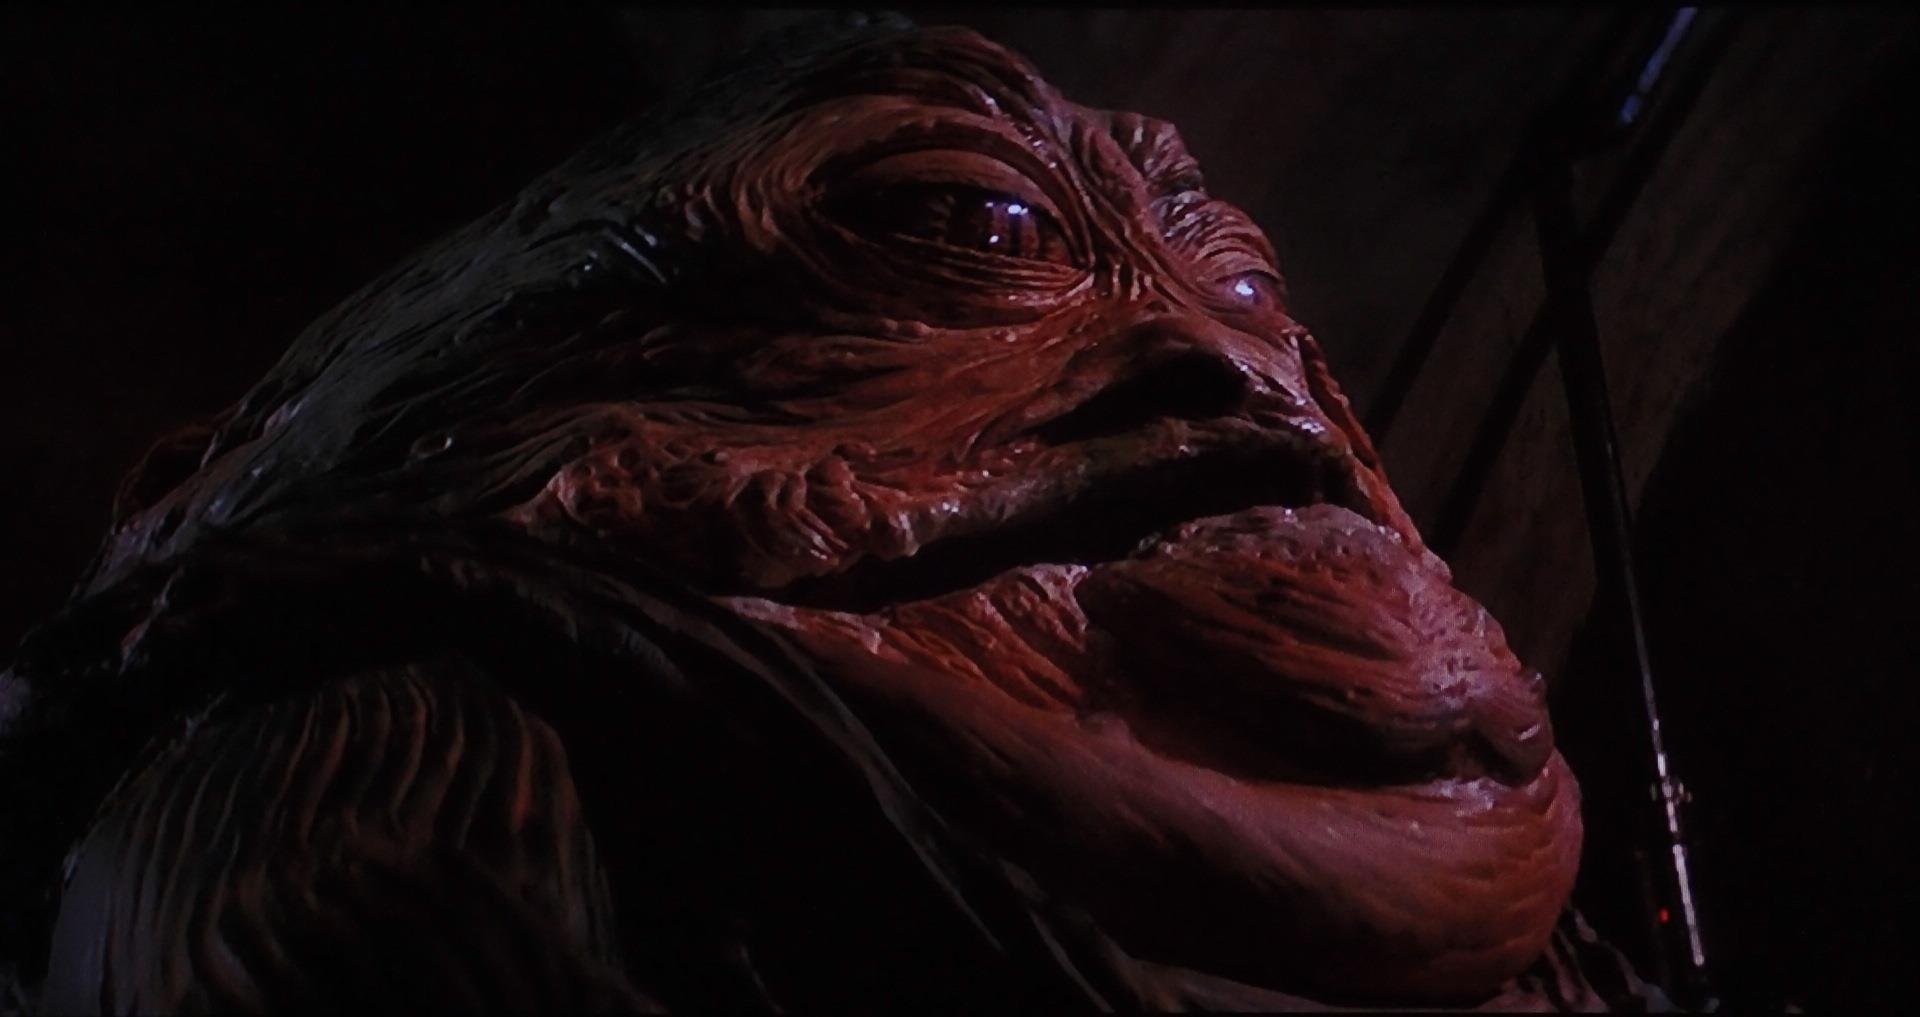 Jabba The Hutt Watching You Fap By Davidllou 5